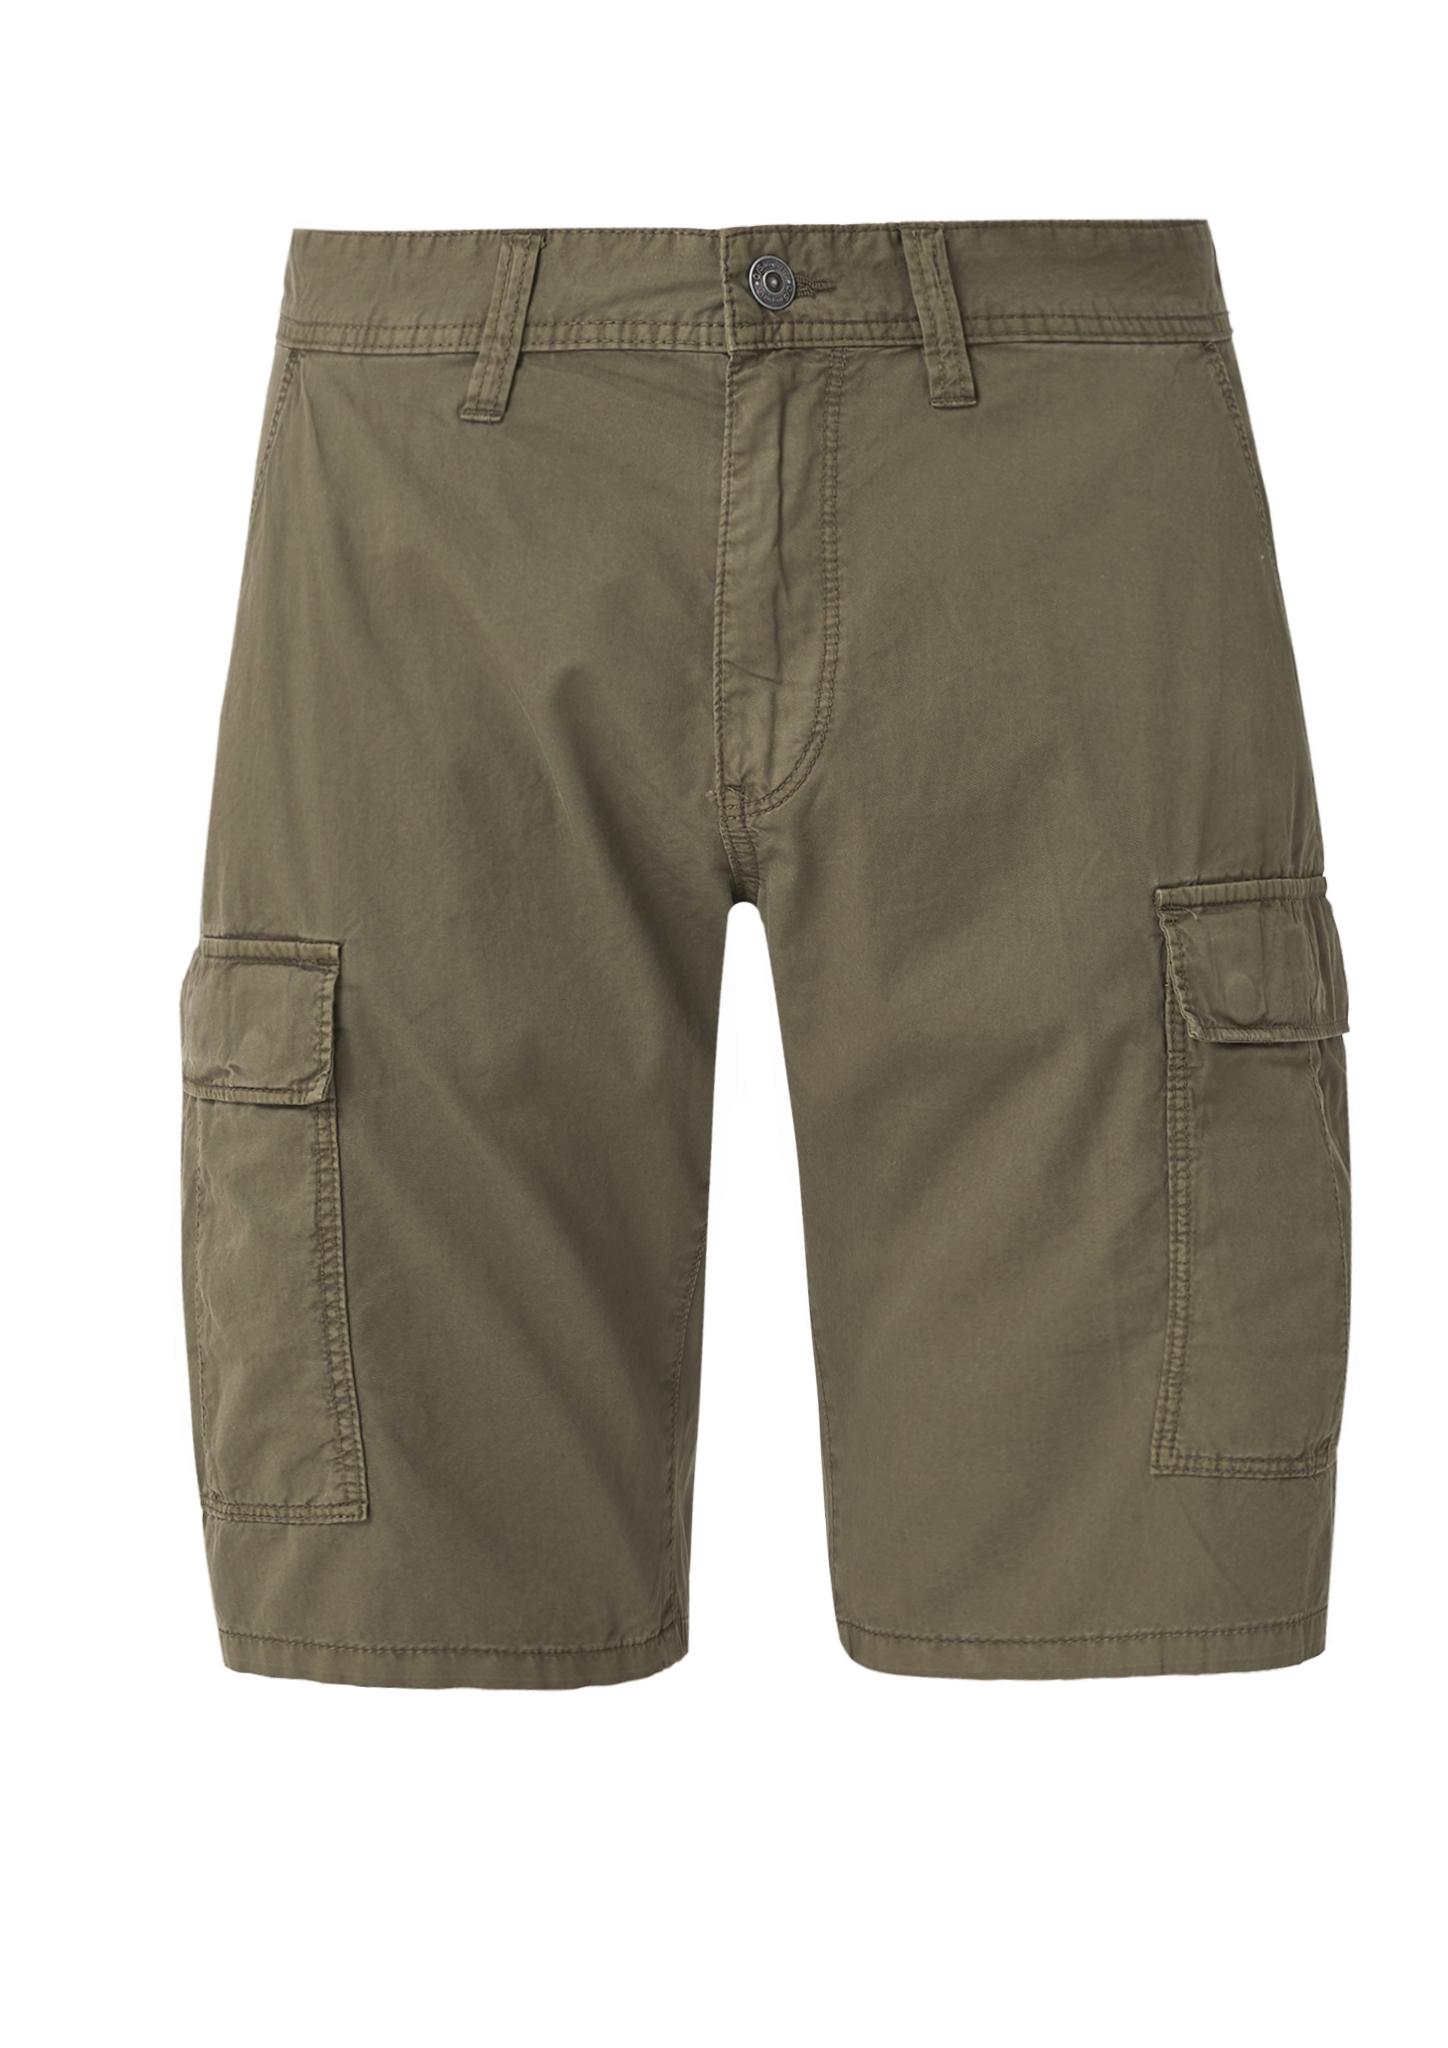 Bermuda | Bekleidung > Shorts & Bermudas > Bermudas | Q/S designed by